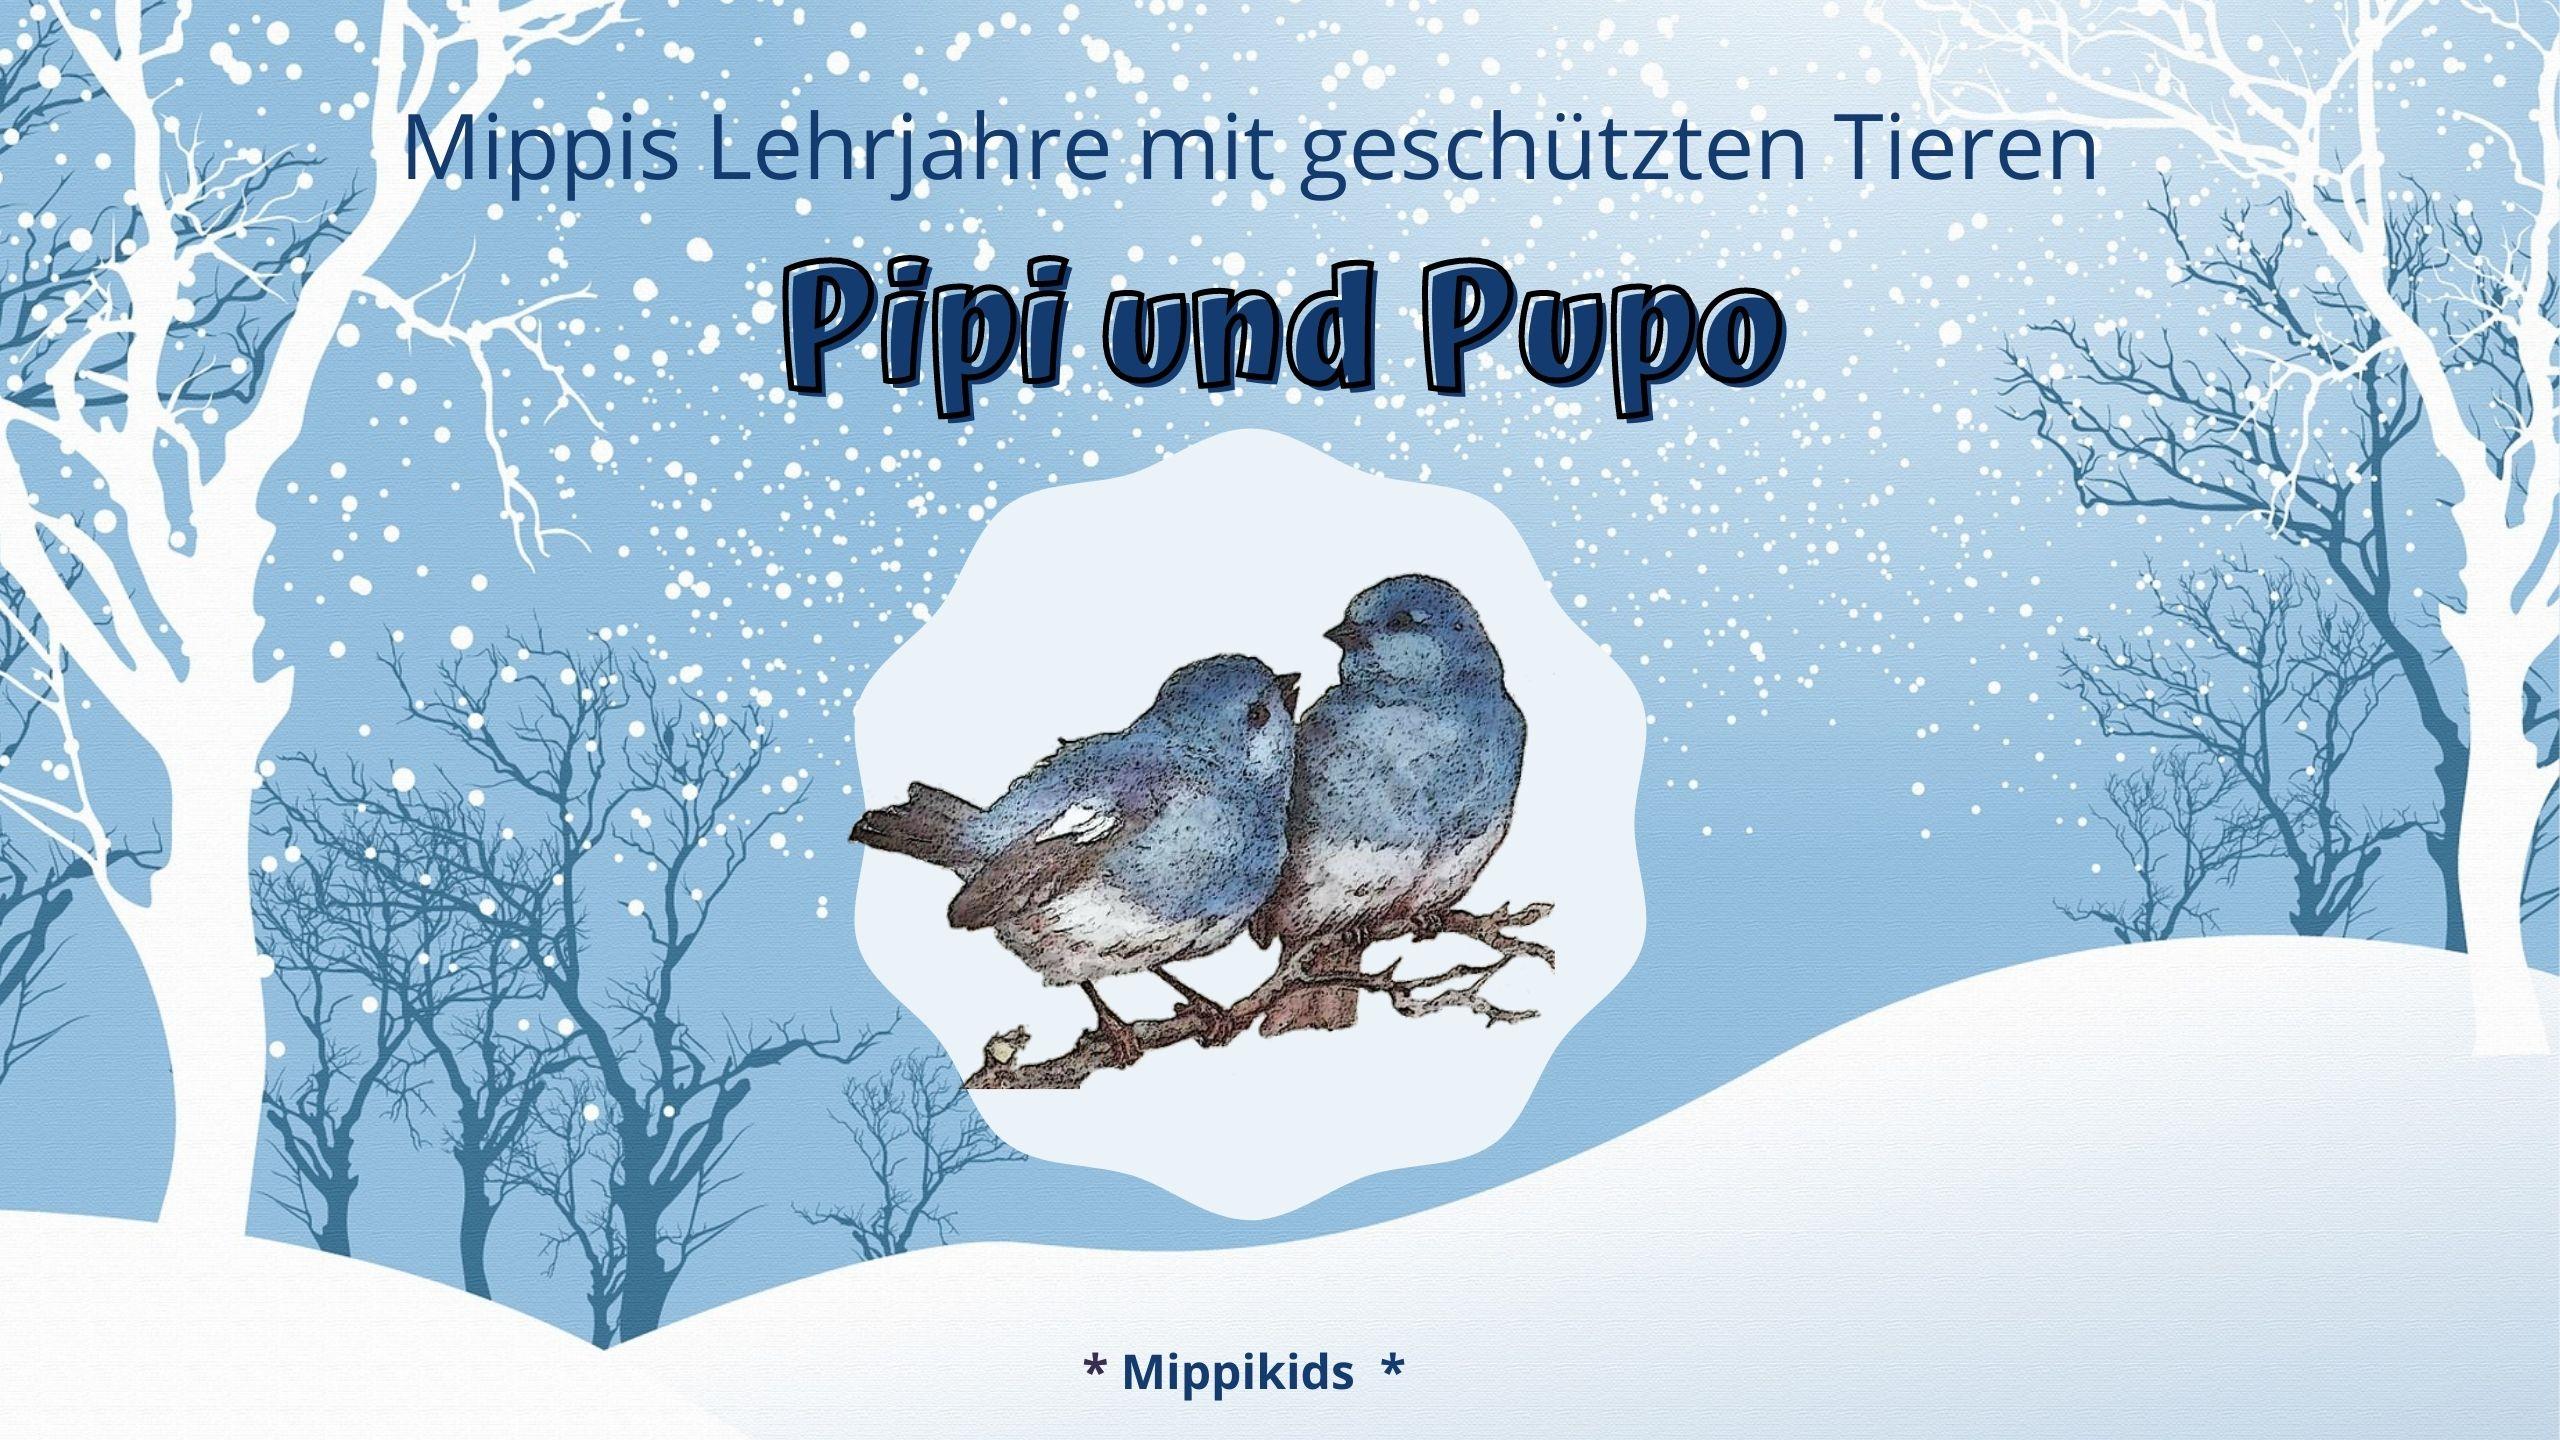 Pipi und Pupo